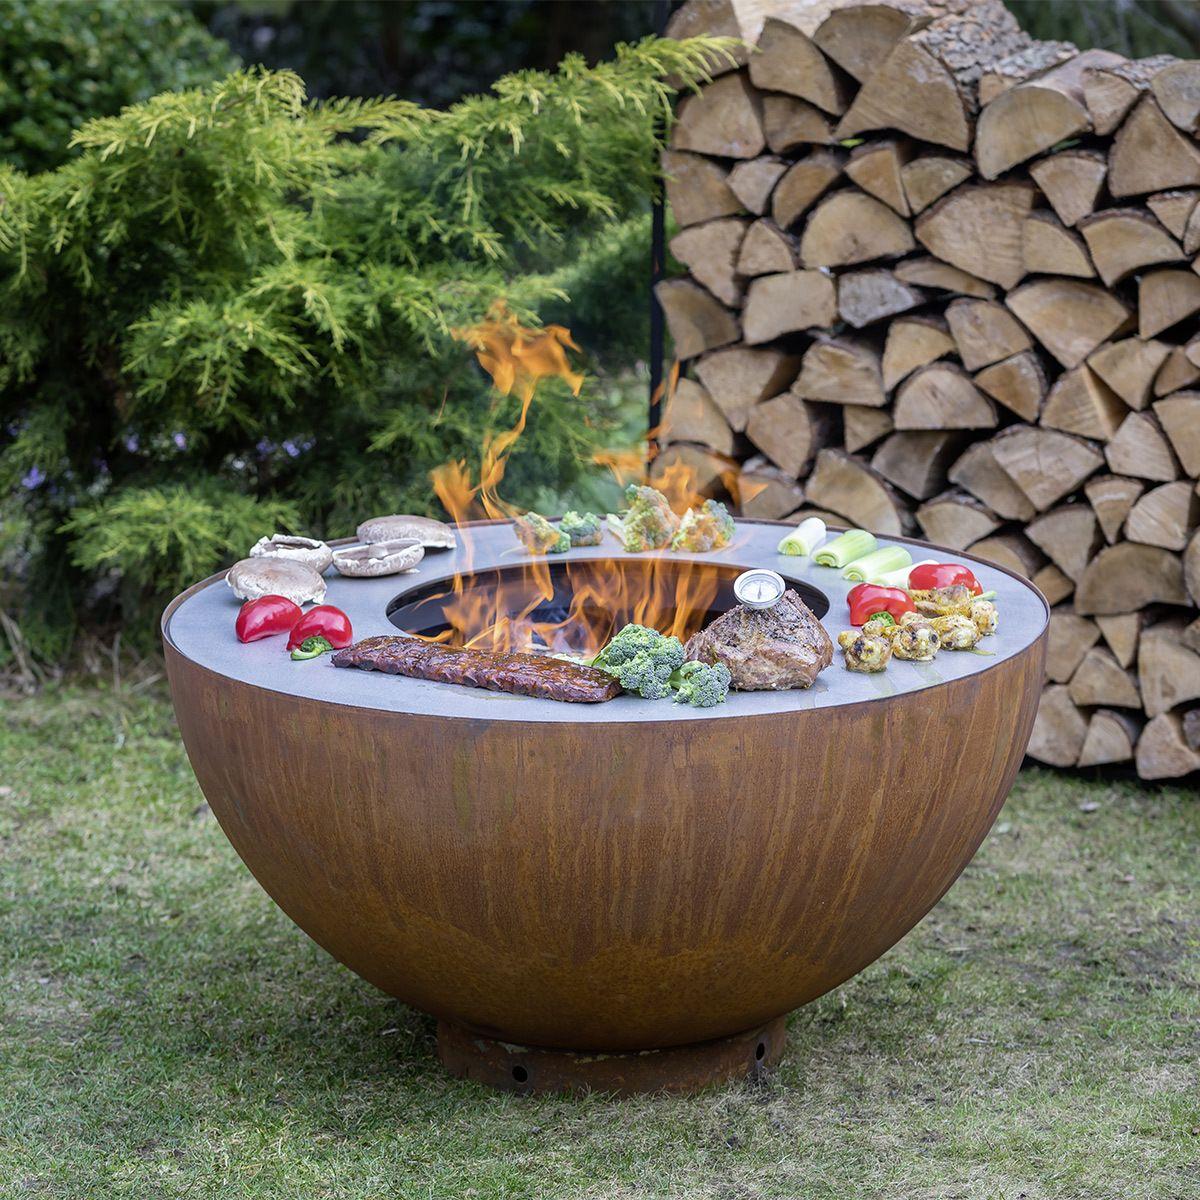 Feu Du Jardin Brasero Barbecue Plancha Boule Brasero Feu Du